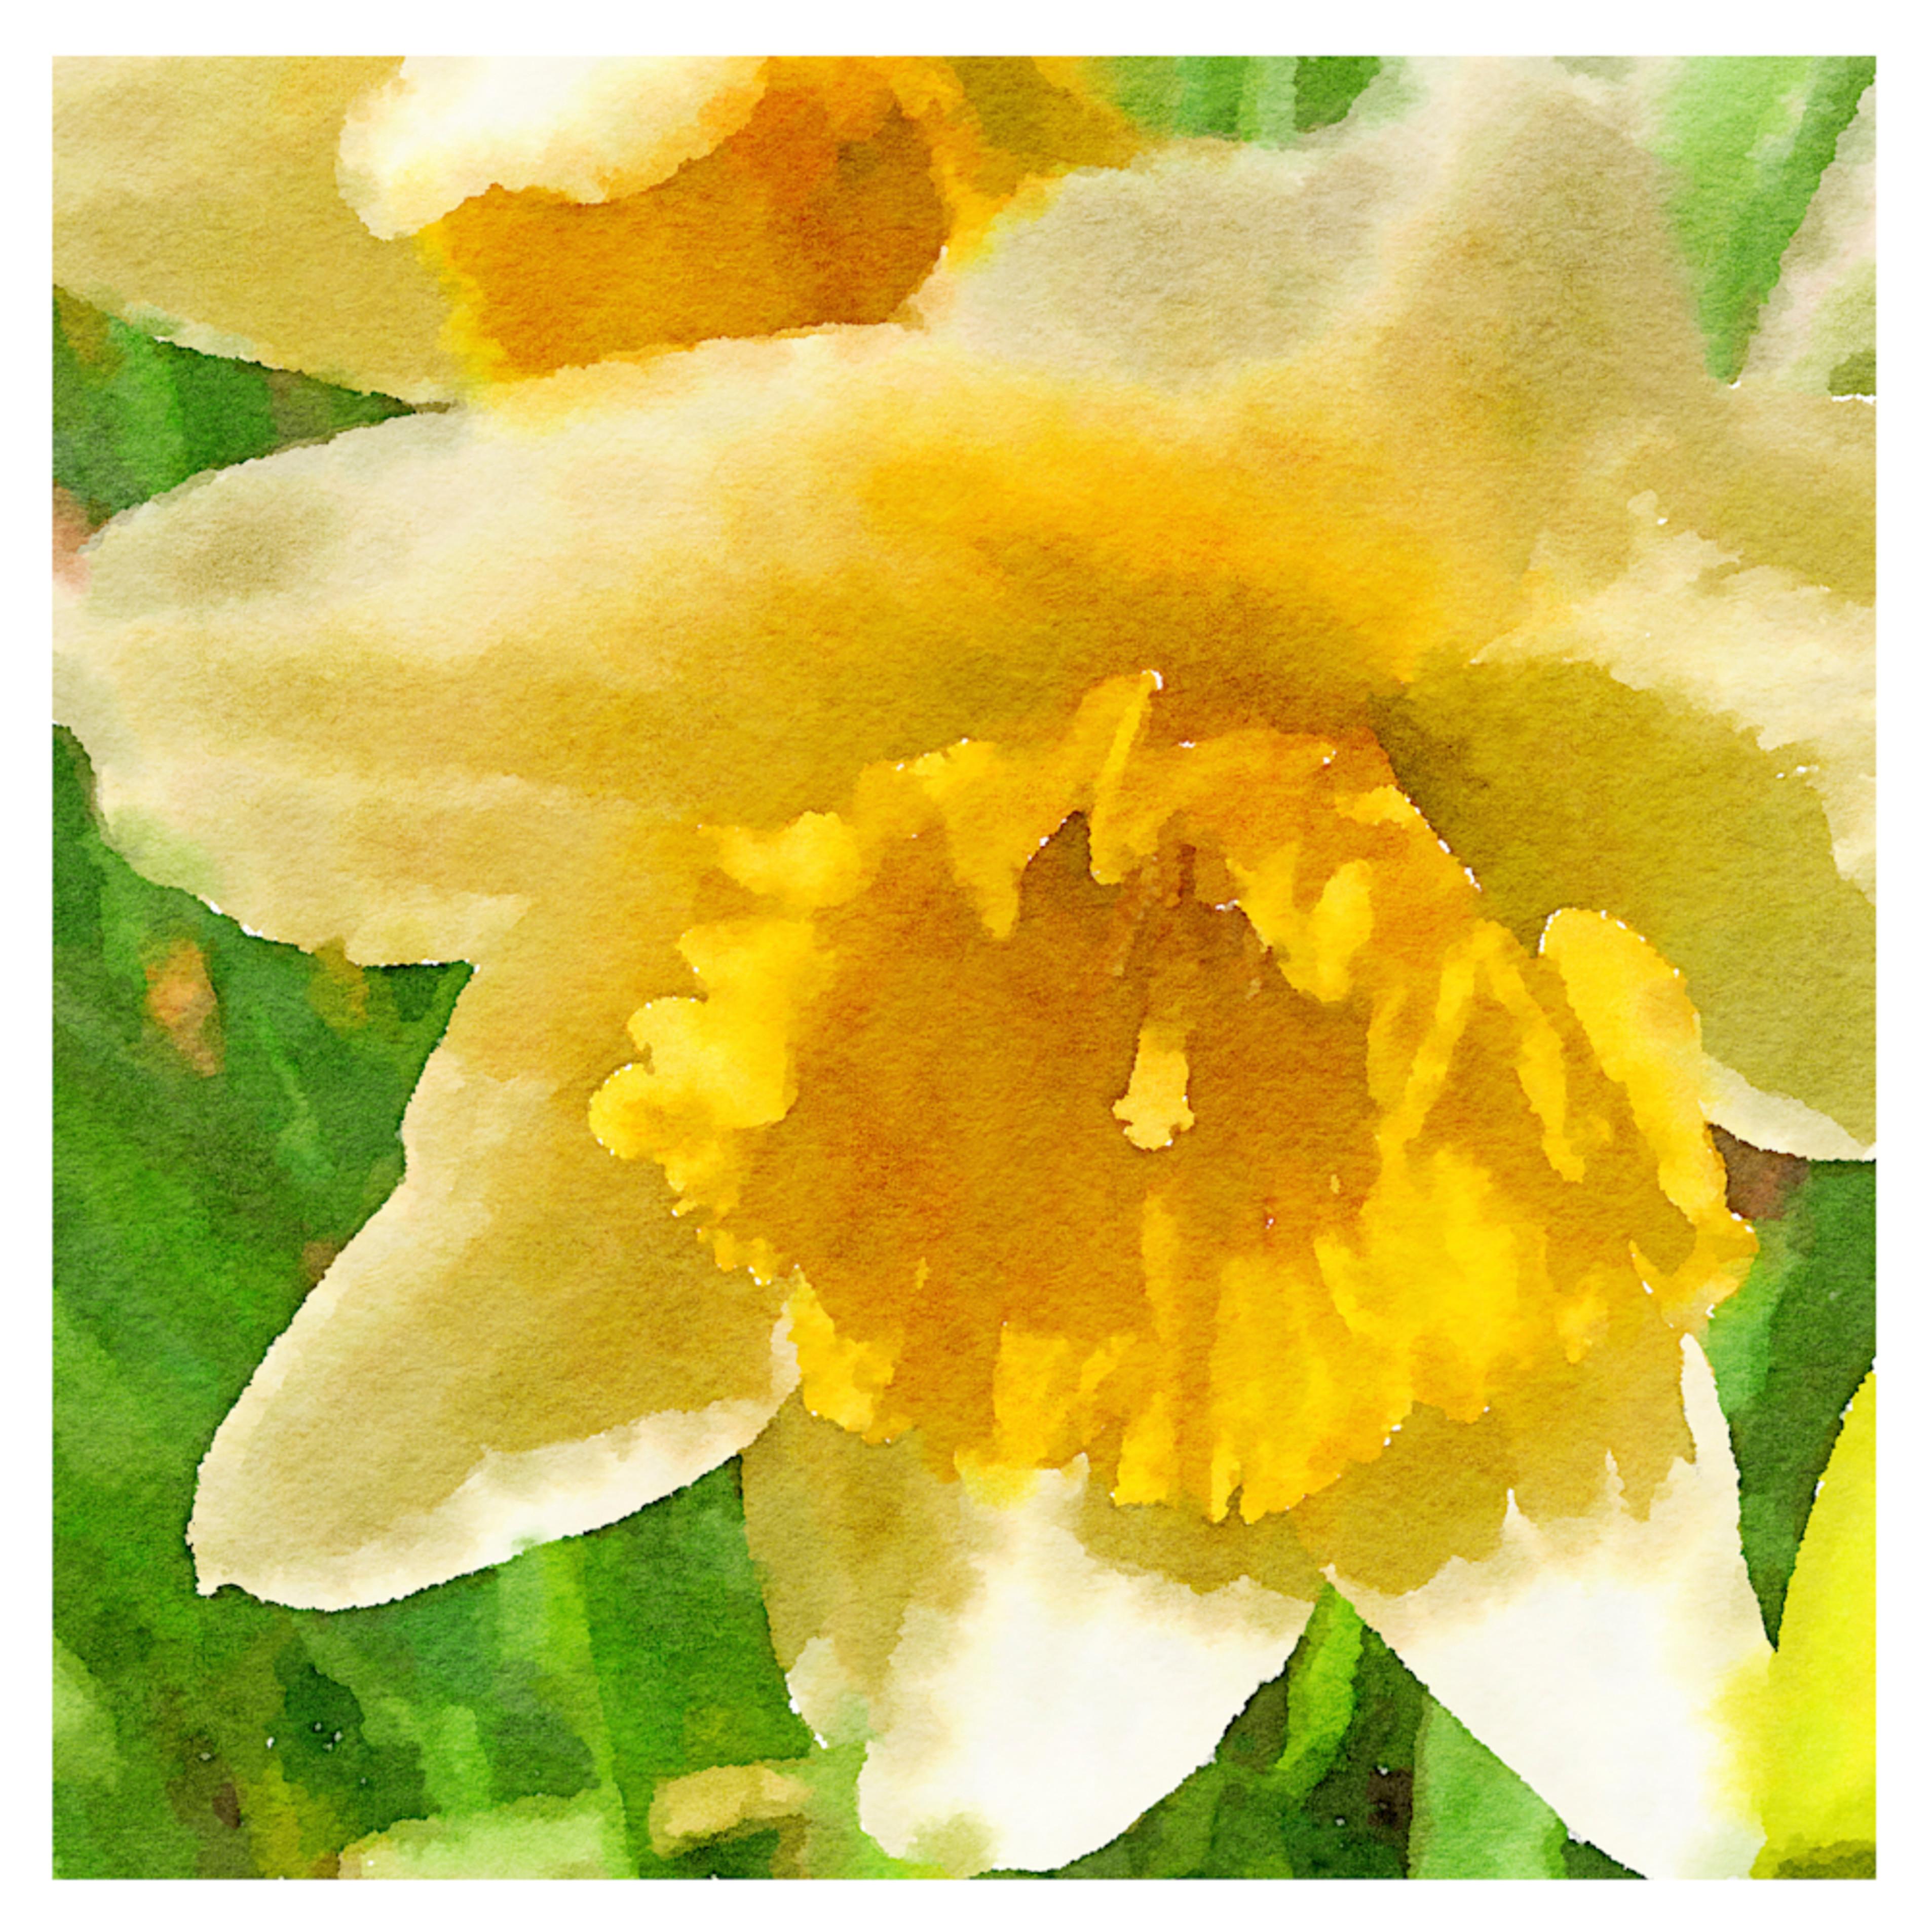 Daffodil watetercolor jefkyj